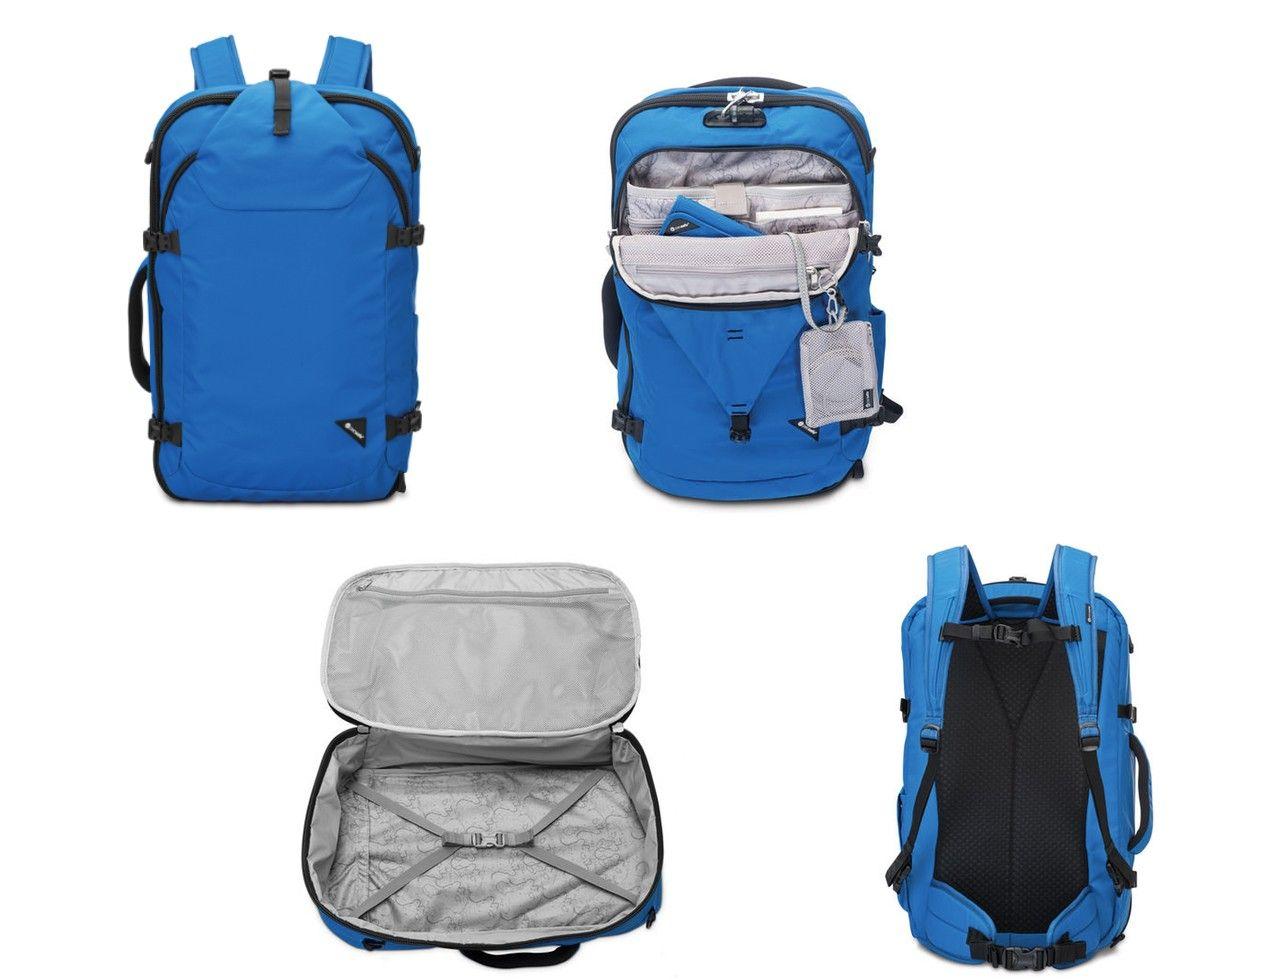 cbb16ec11270 Pacsafe Venturesafe 45 multi-view | Travel | Best travel backpack ...